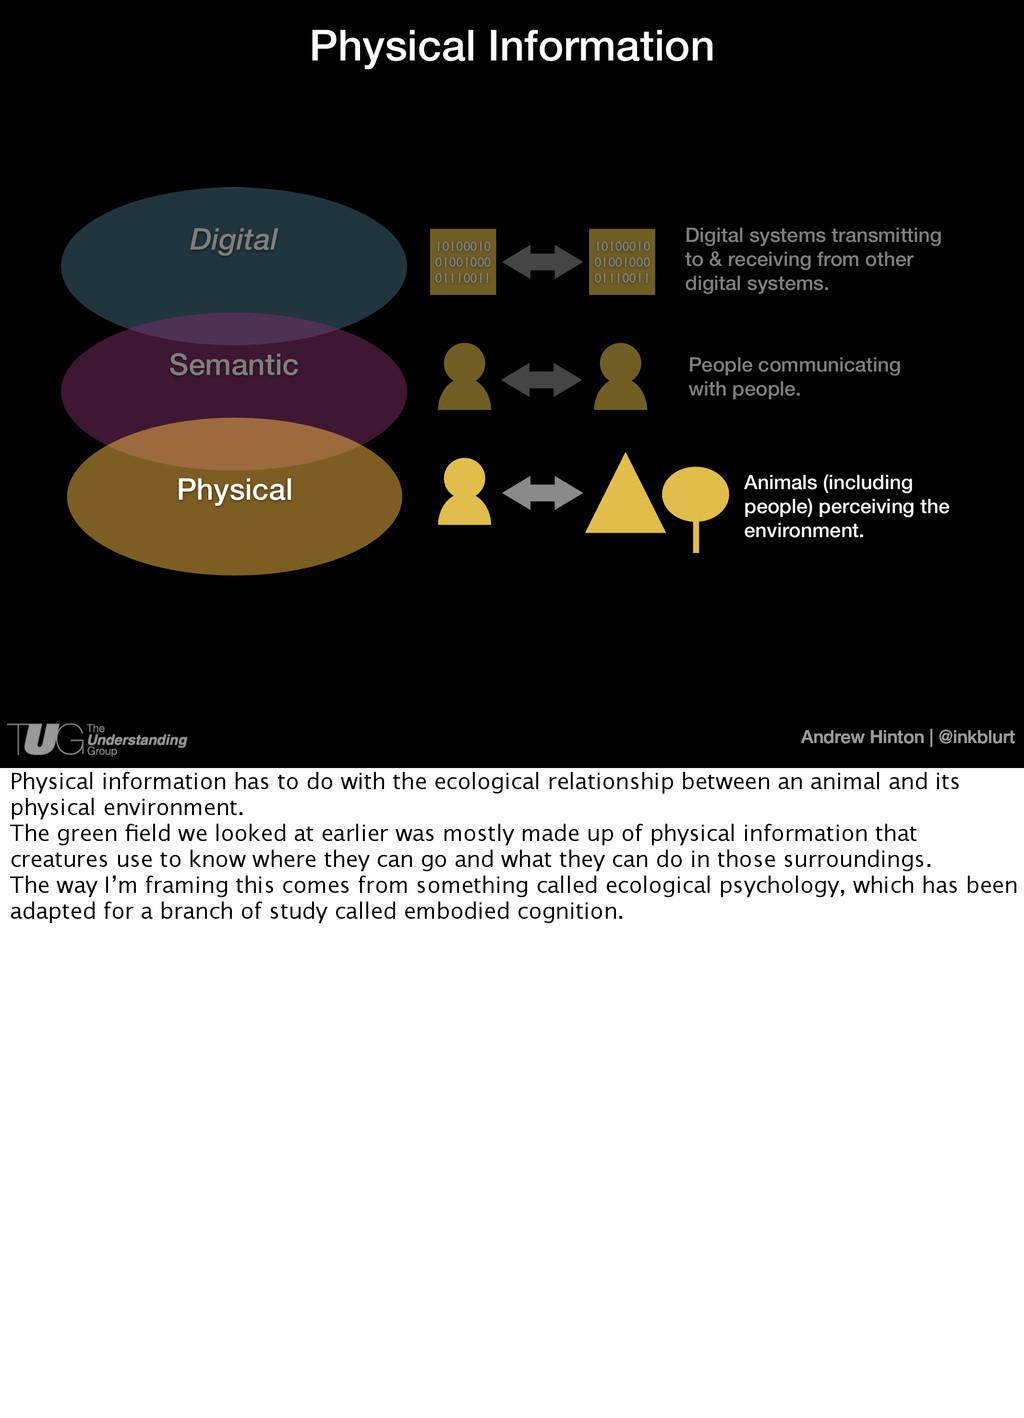 Andrew Hinton   @inkblurt Physical Information ...